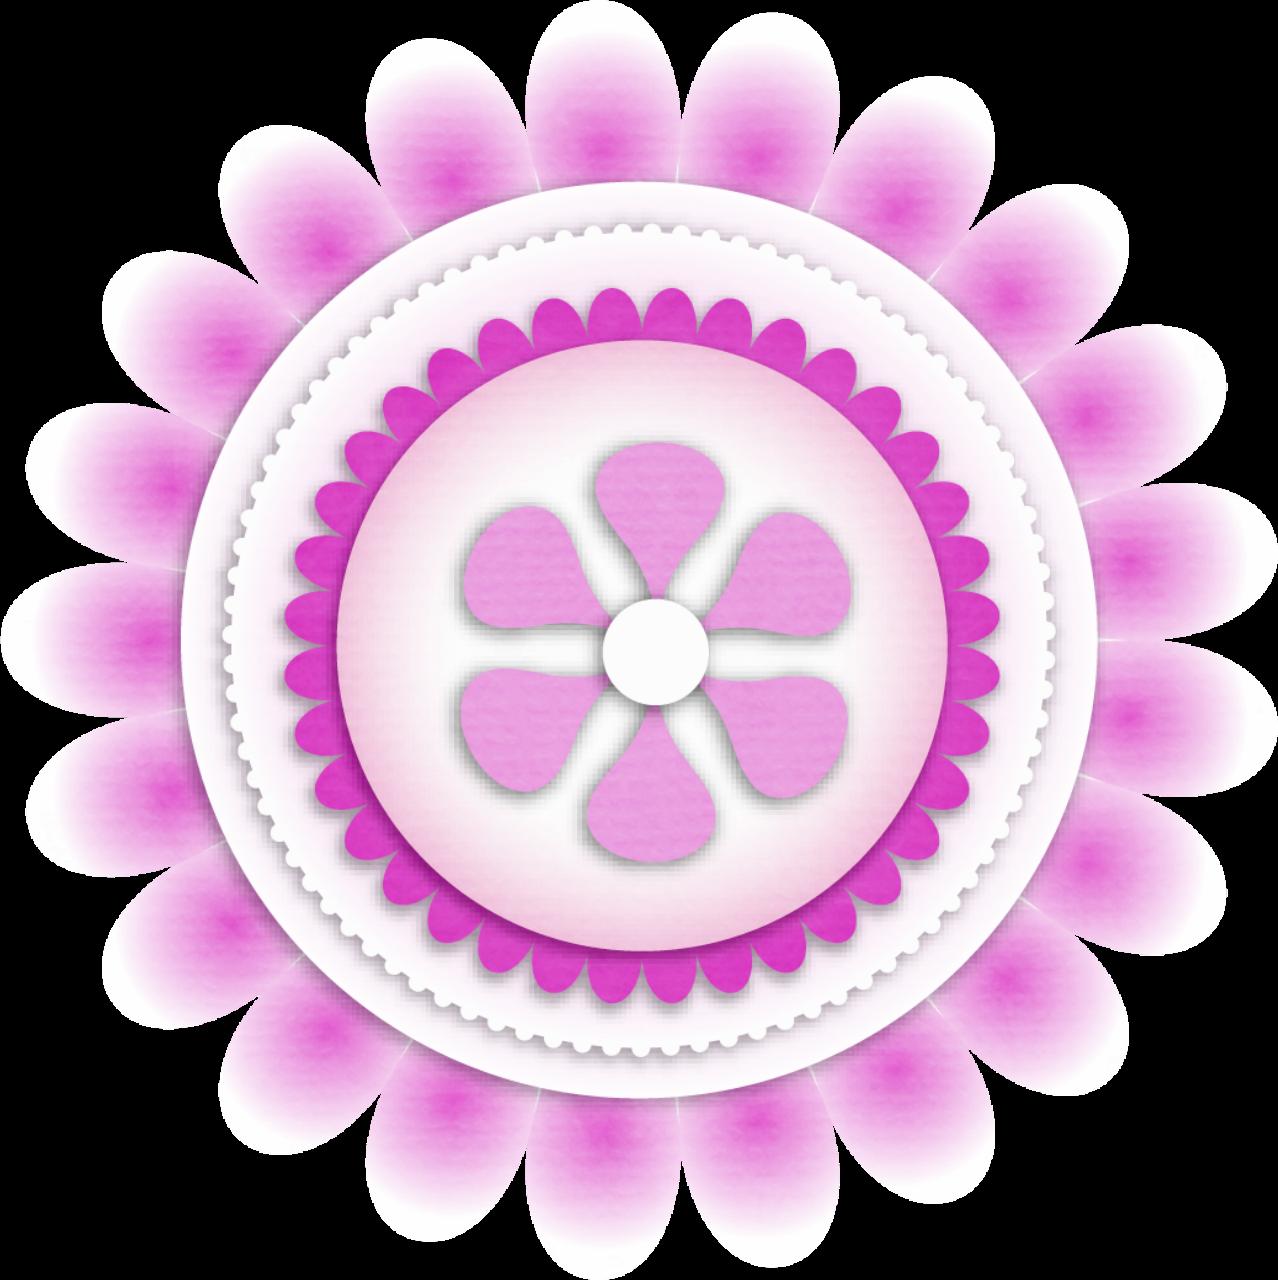 jpg Buttons clipart craft. Pin by lisabwd digiscrap.